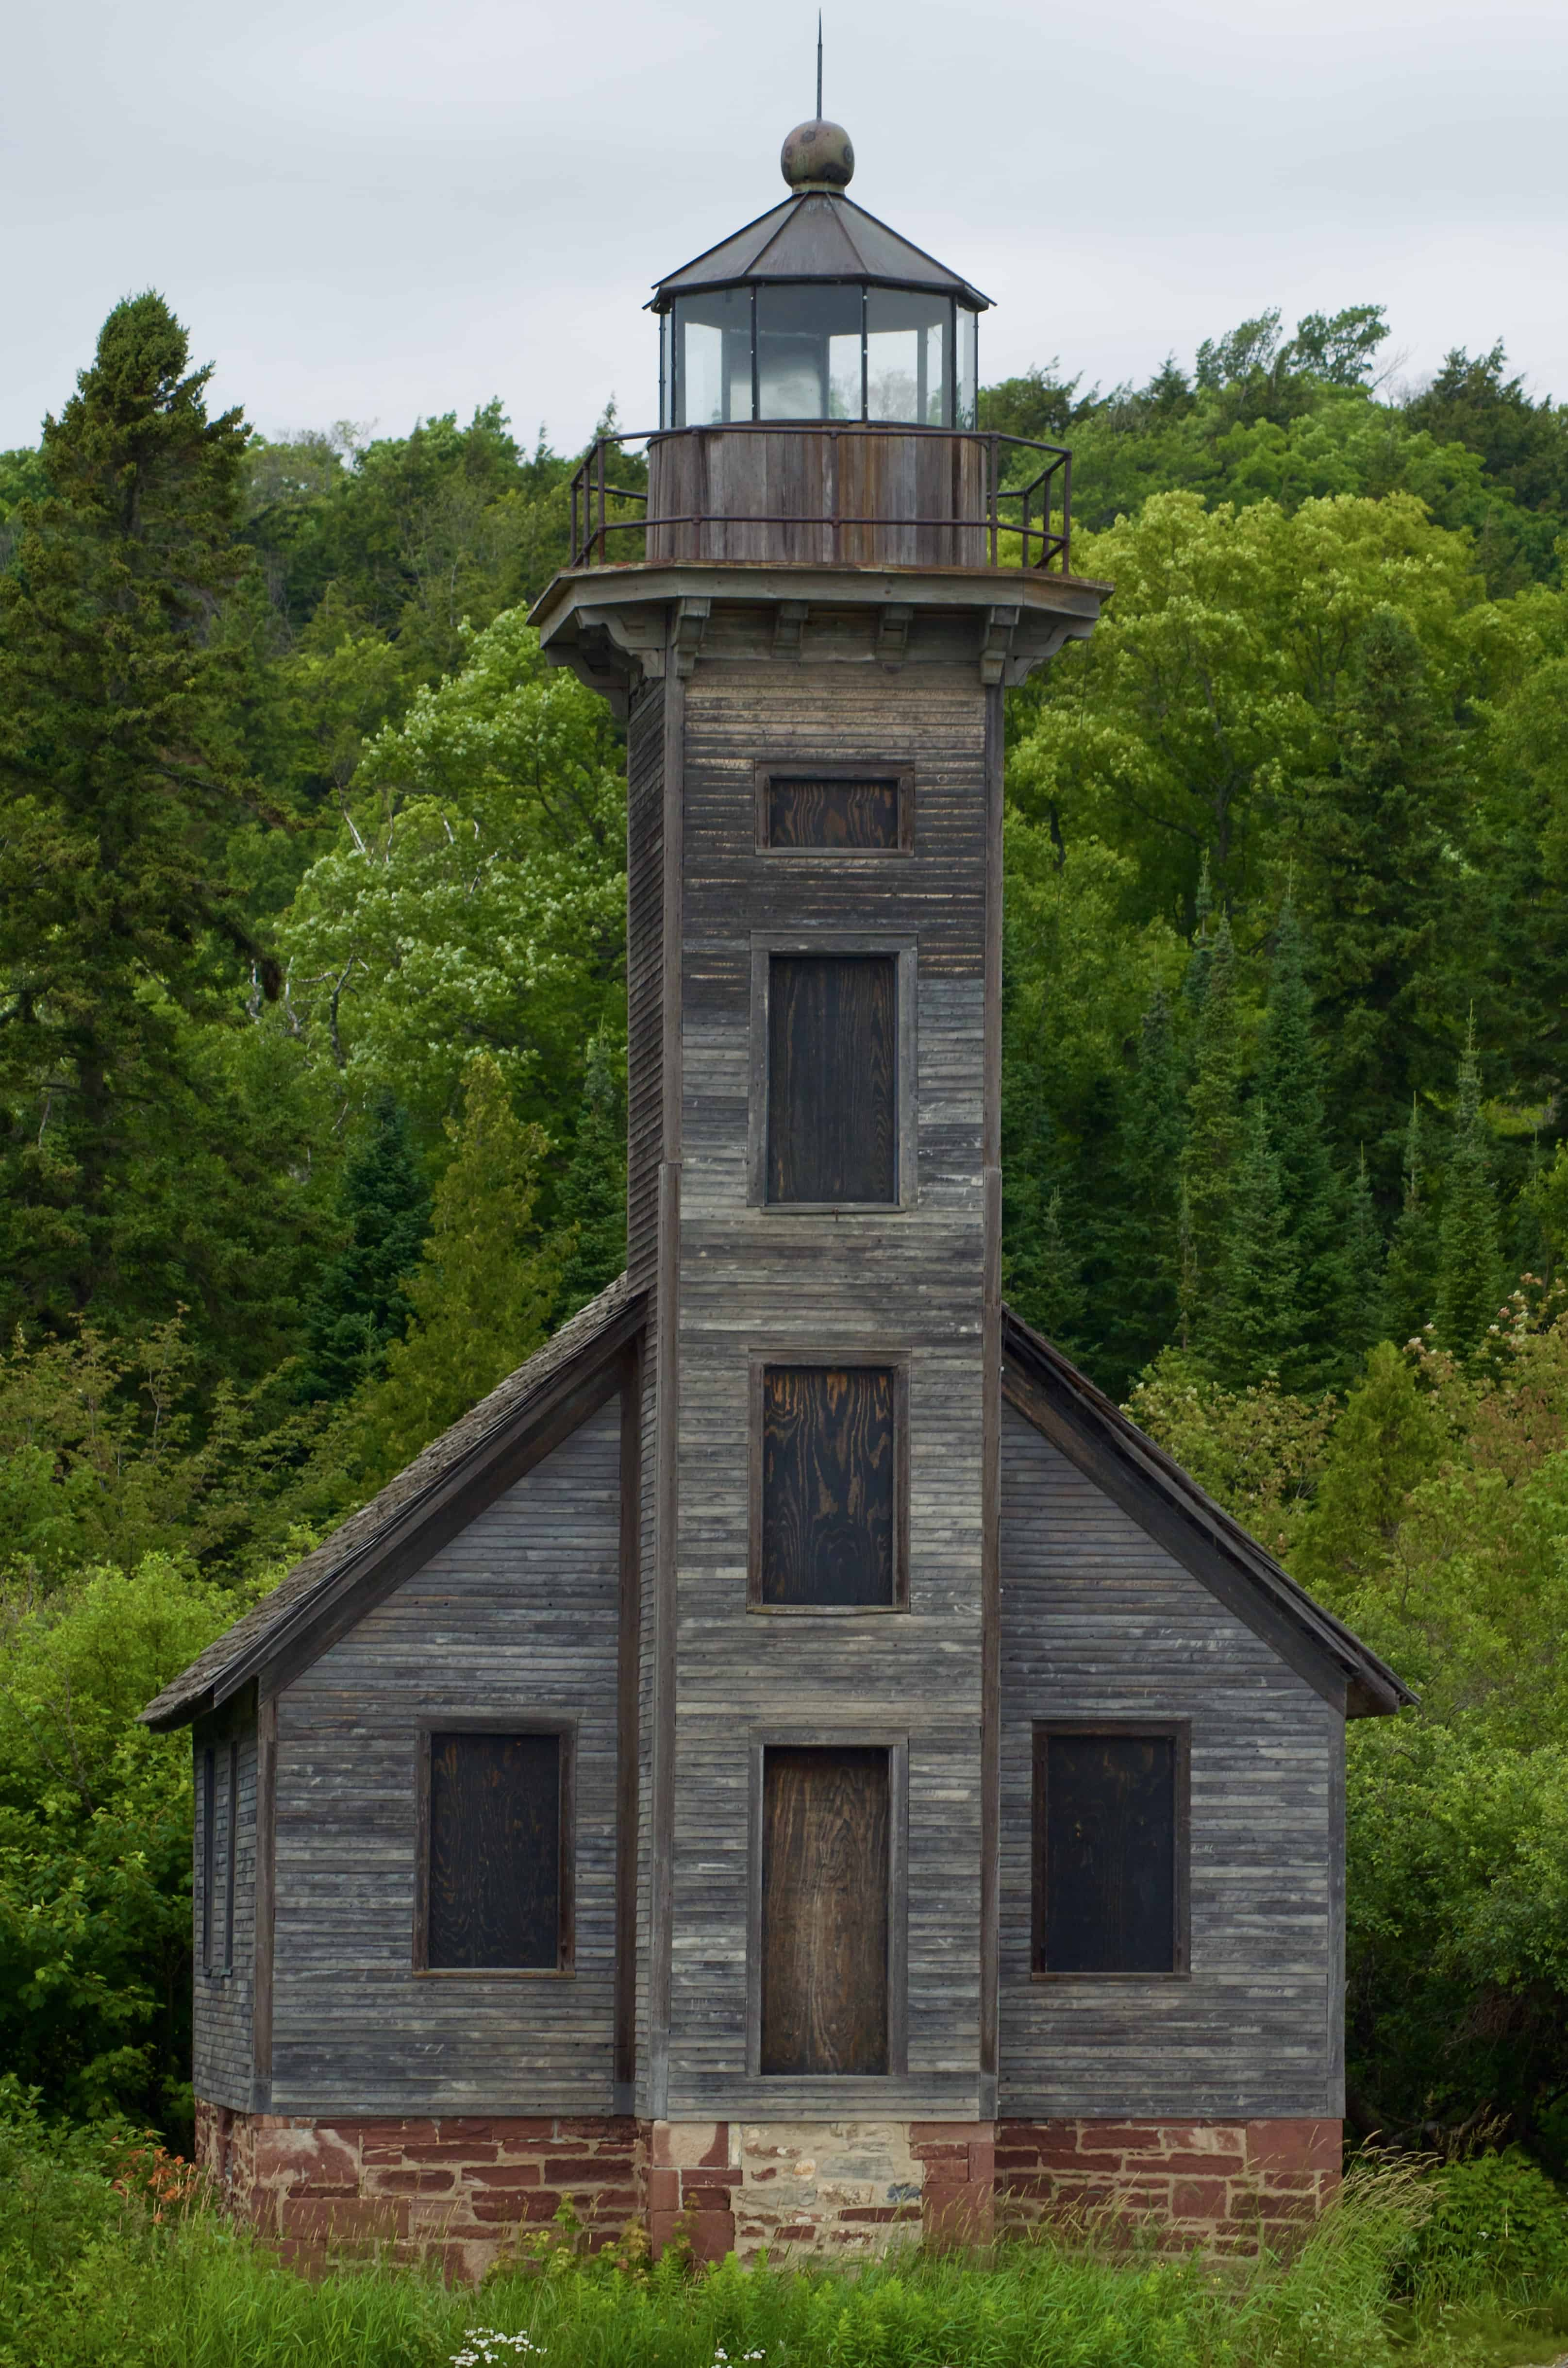 Historic Lighthouse on Shipwreck Tours in Munising Michigan